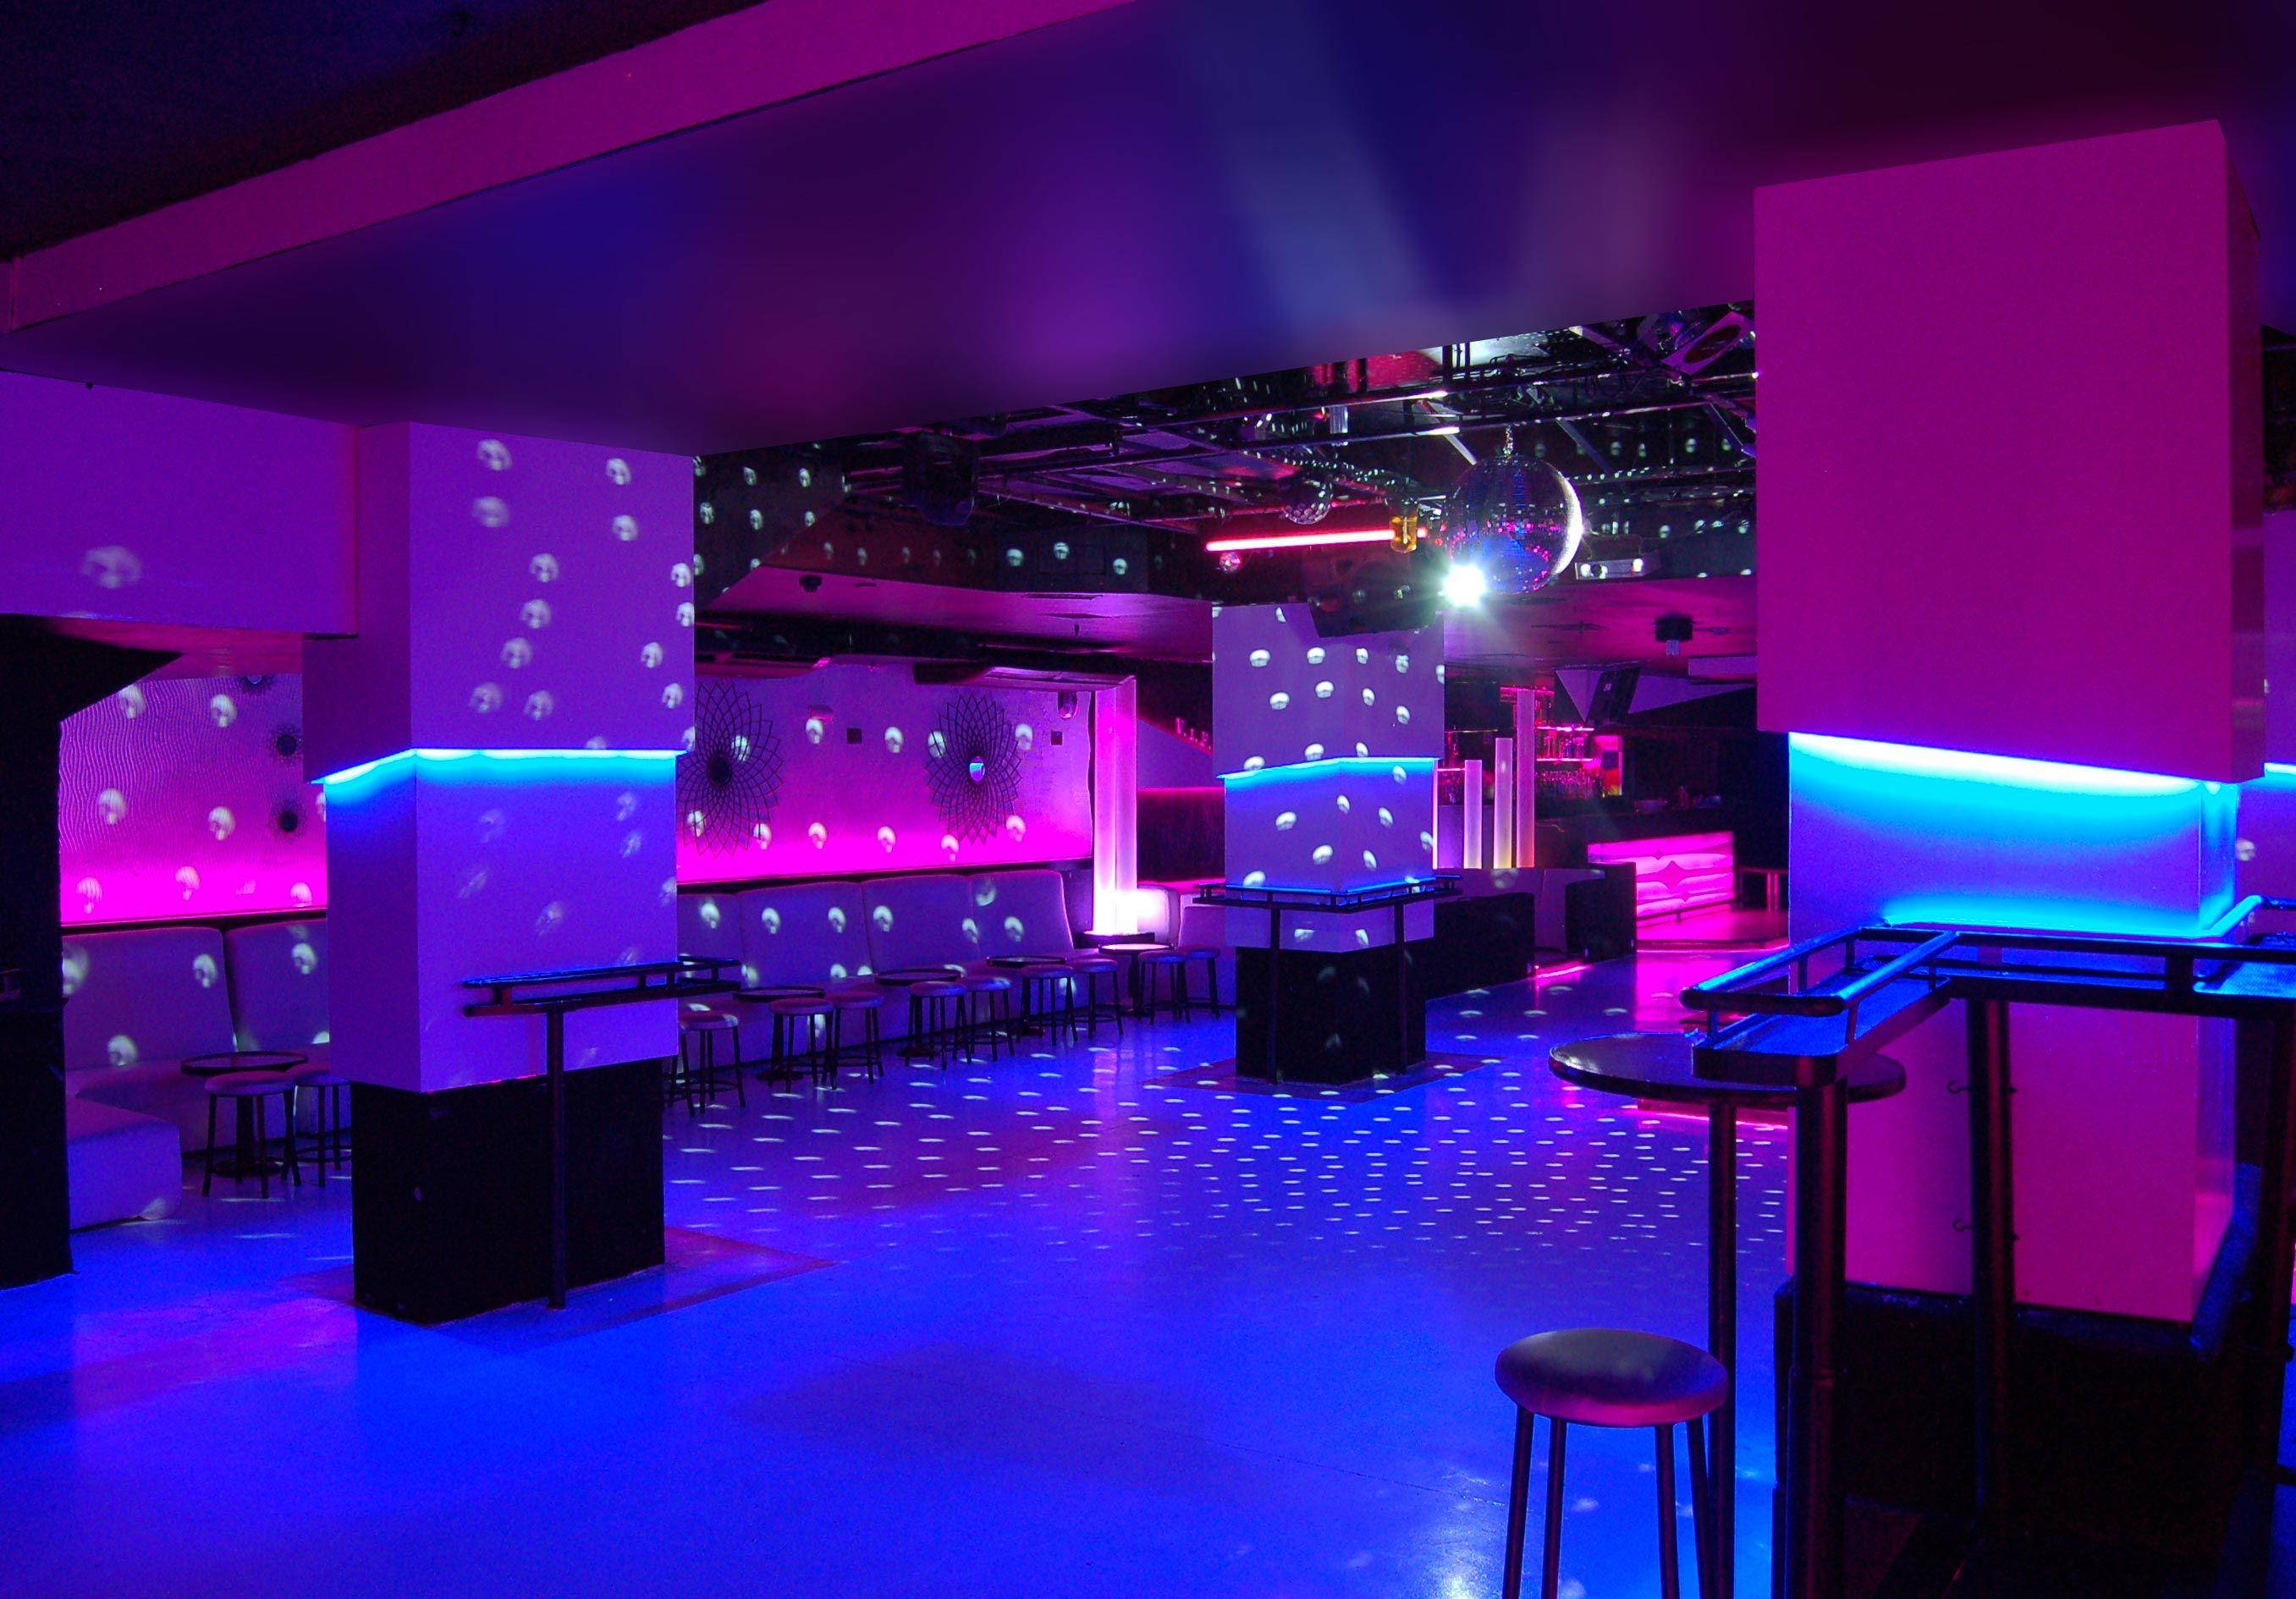 Night club interior design silvan francisco discoteca ozona vip in madrid 2014 - Discoteca ozona madrid ...